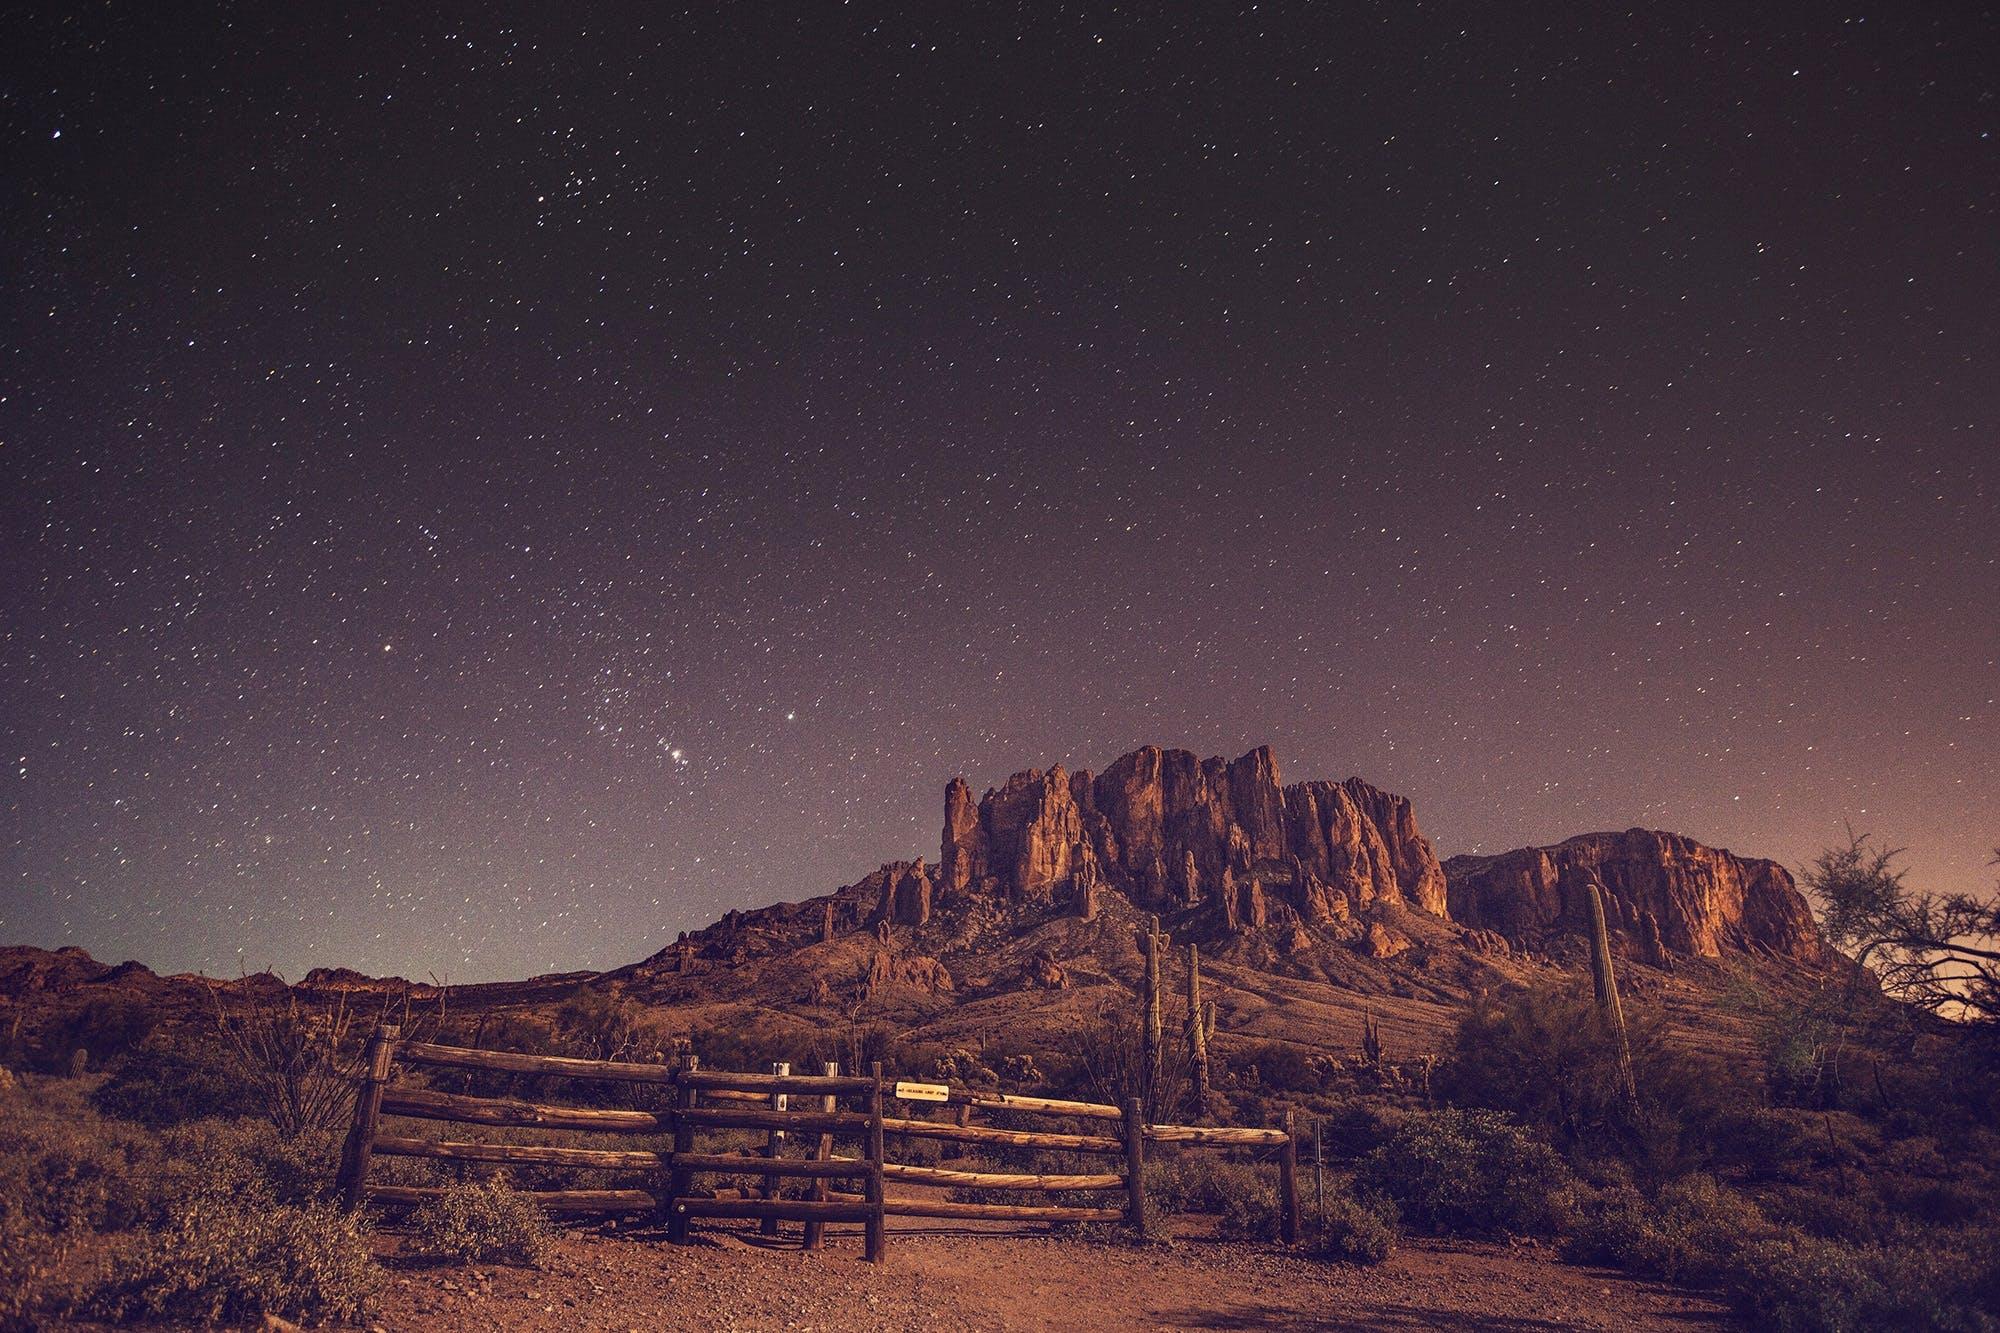 Kostenloses Stock Foto zu abend, astronomie, bäume, berg